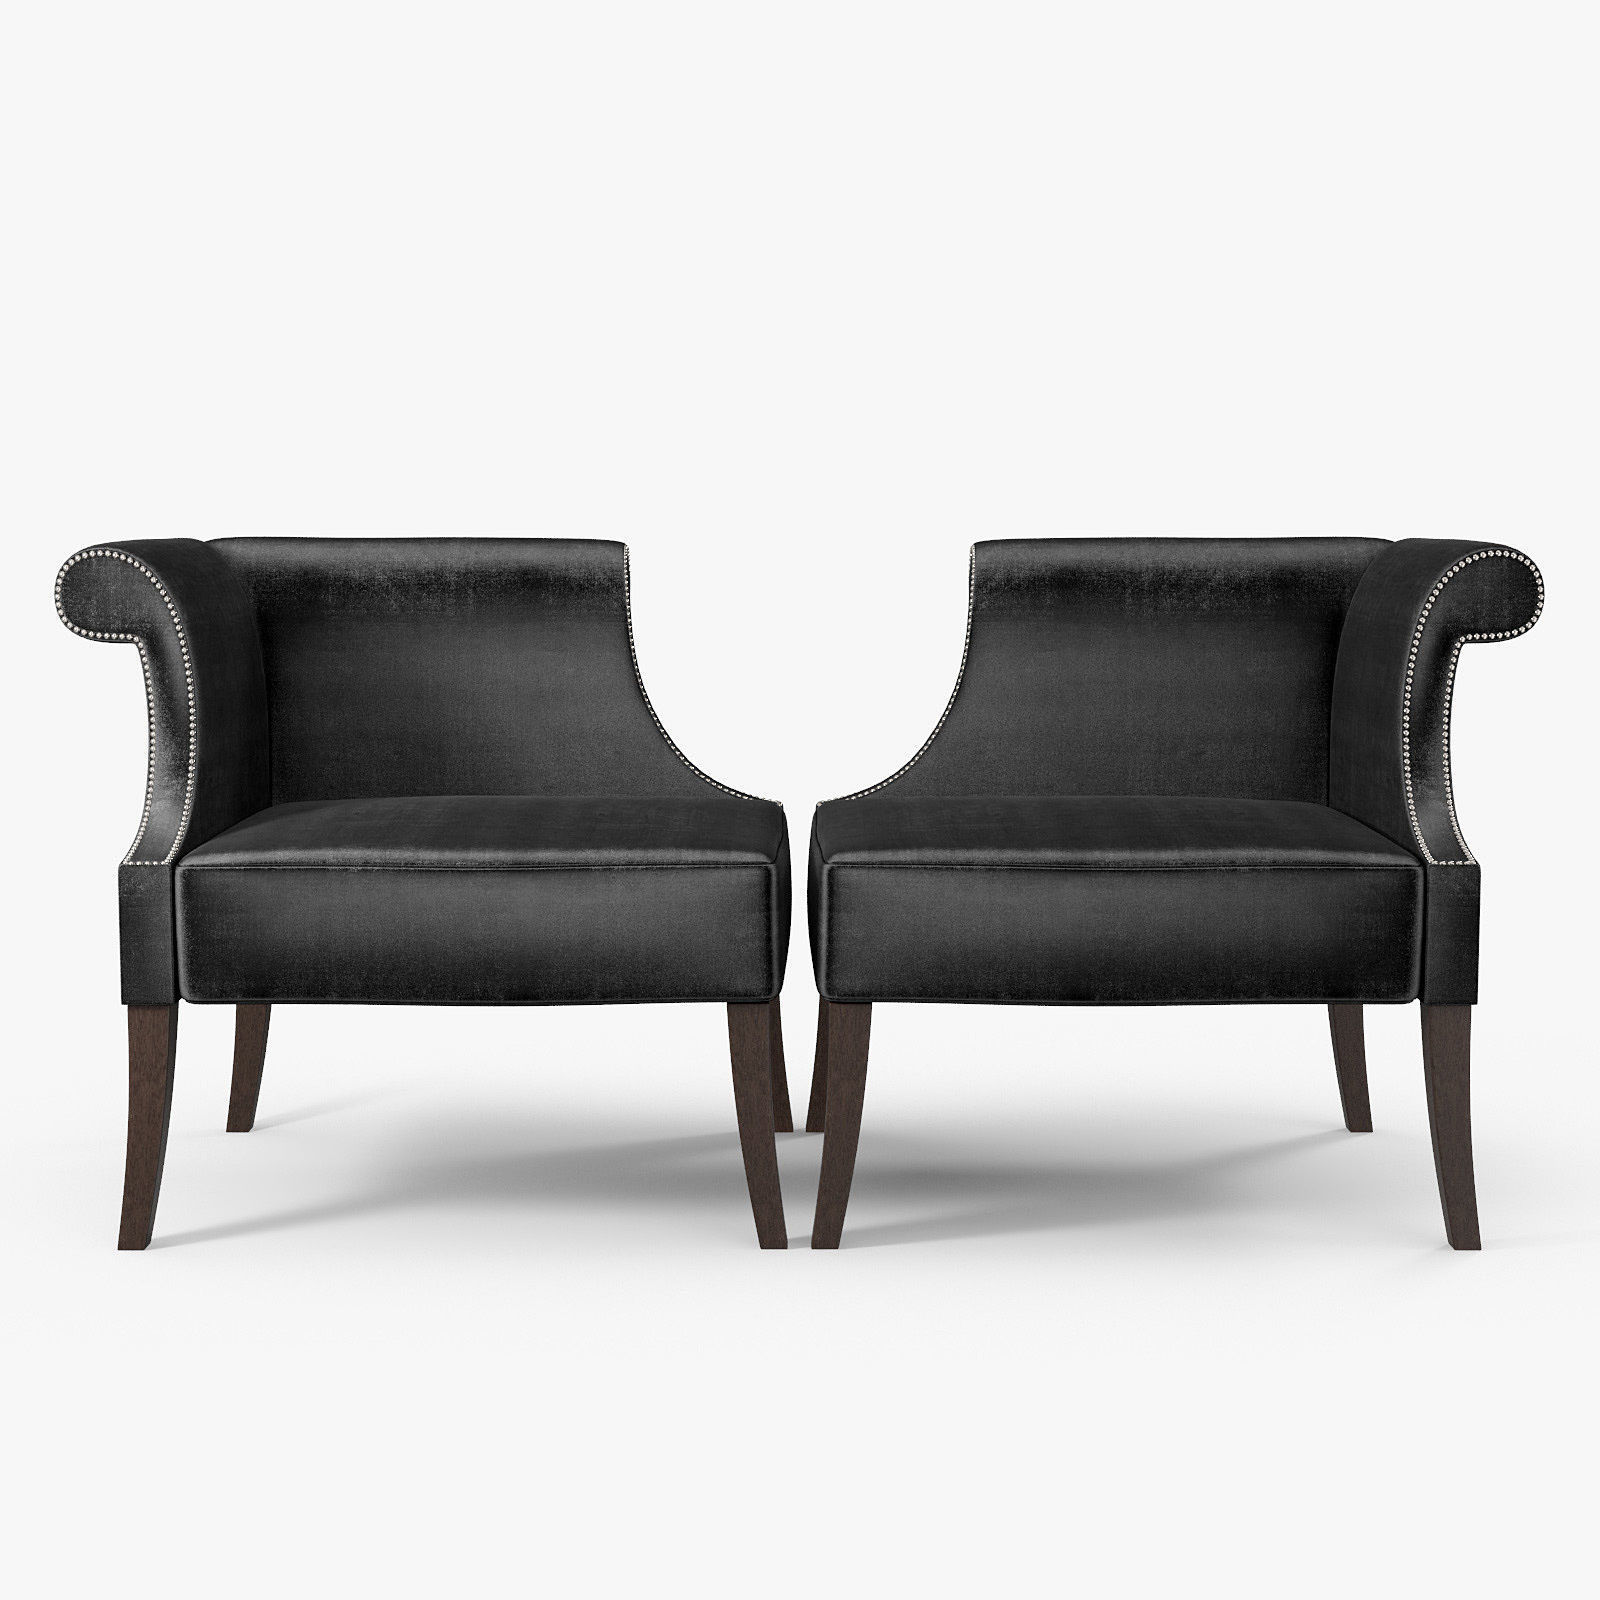 Louise Bradley Winnington Chair 3d Model Max Obj 3ds Fbx Mtl 1